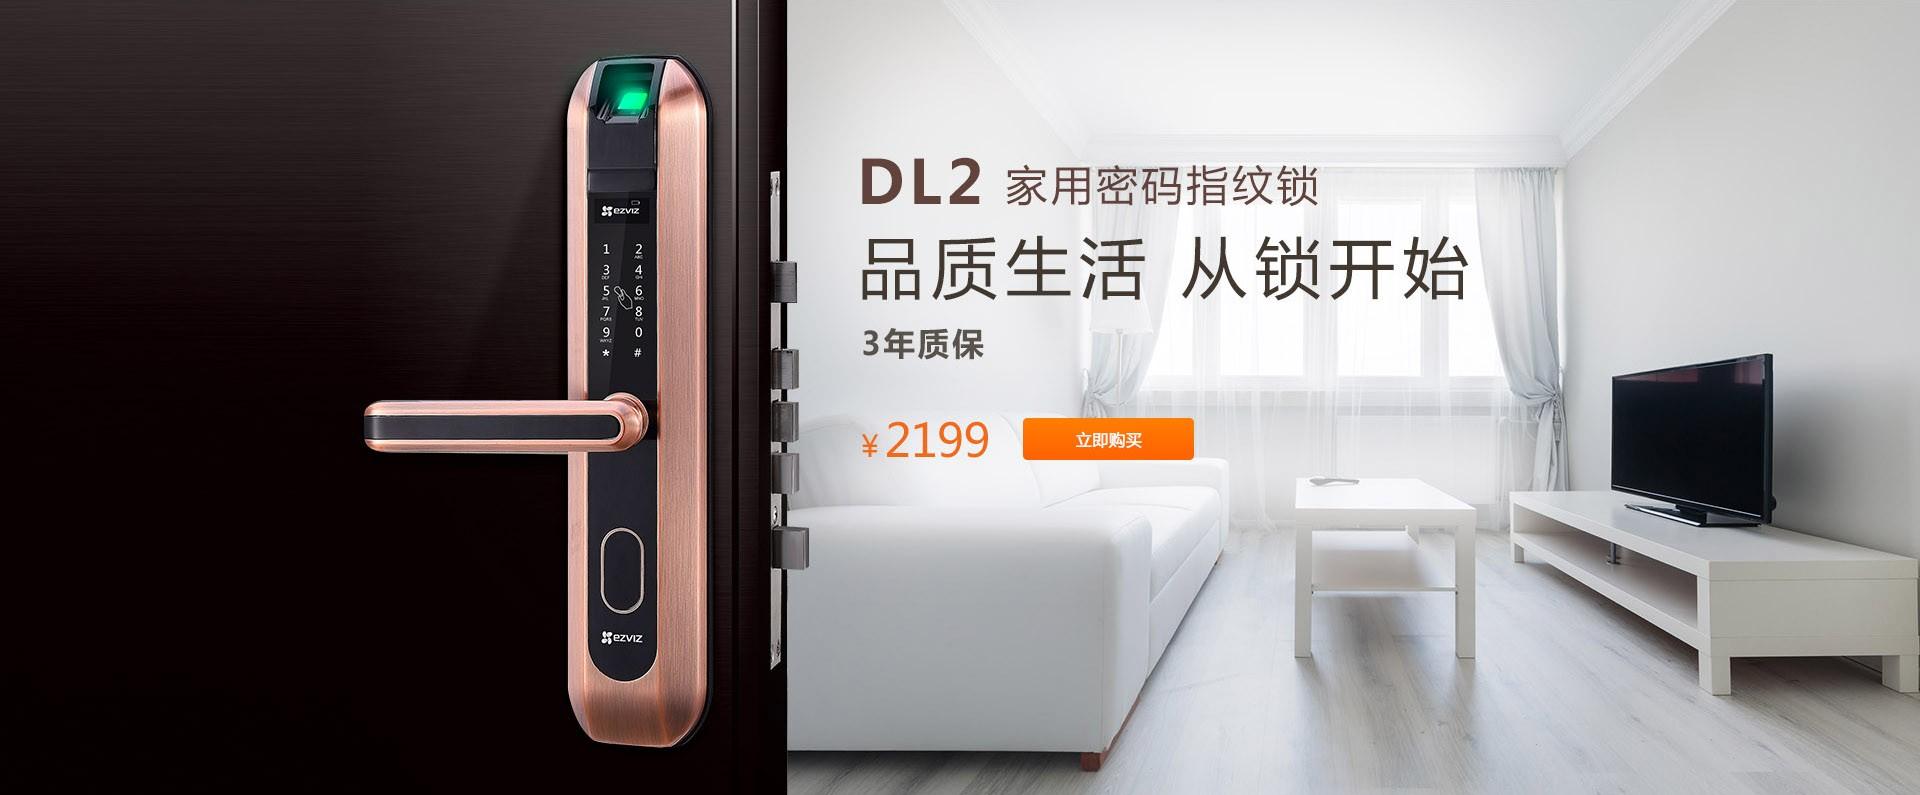 DL2指纹锁_官网.jpg